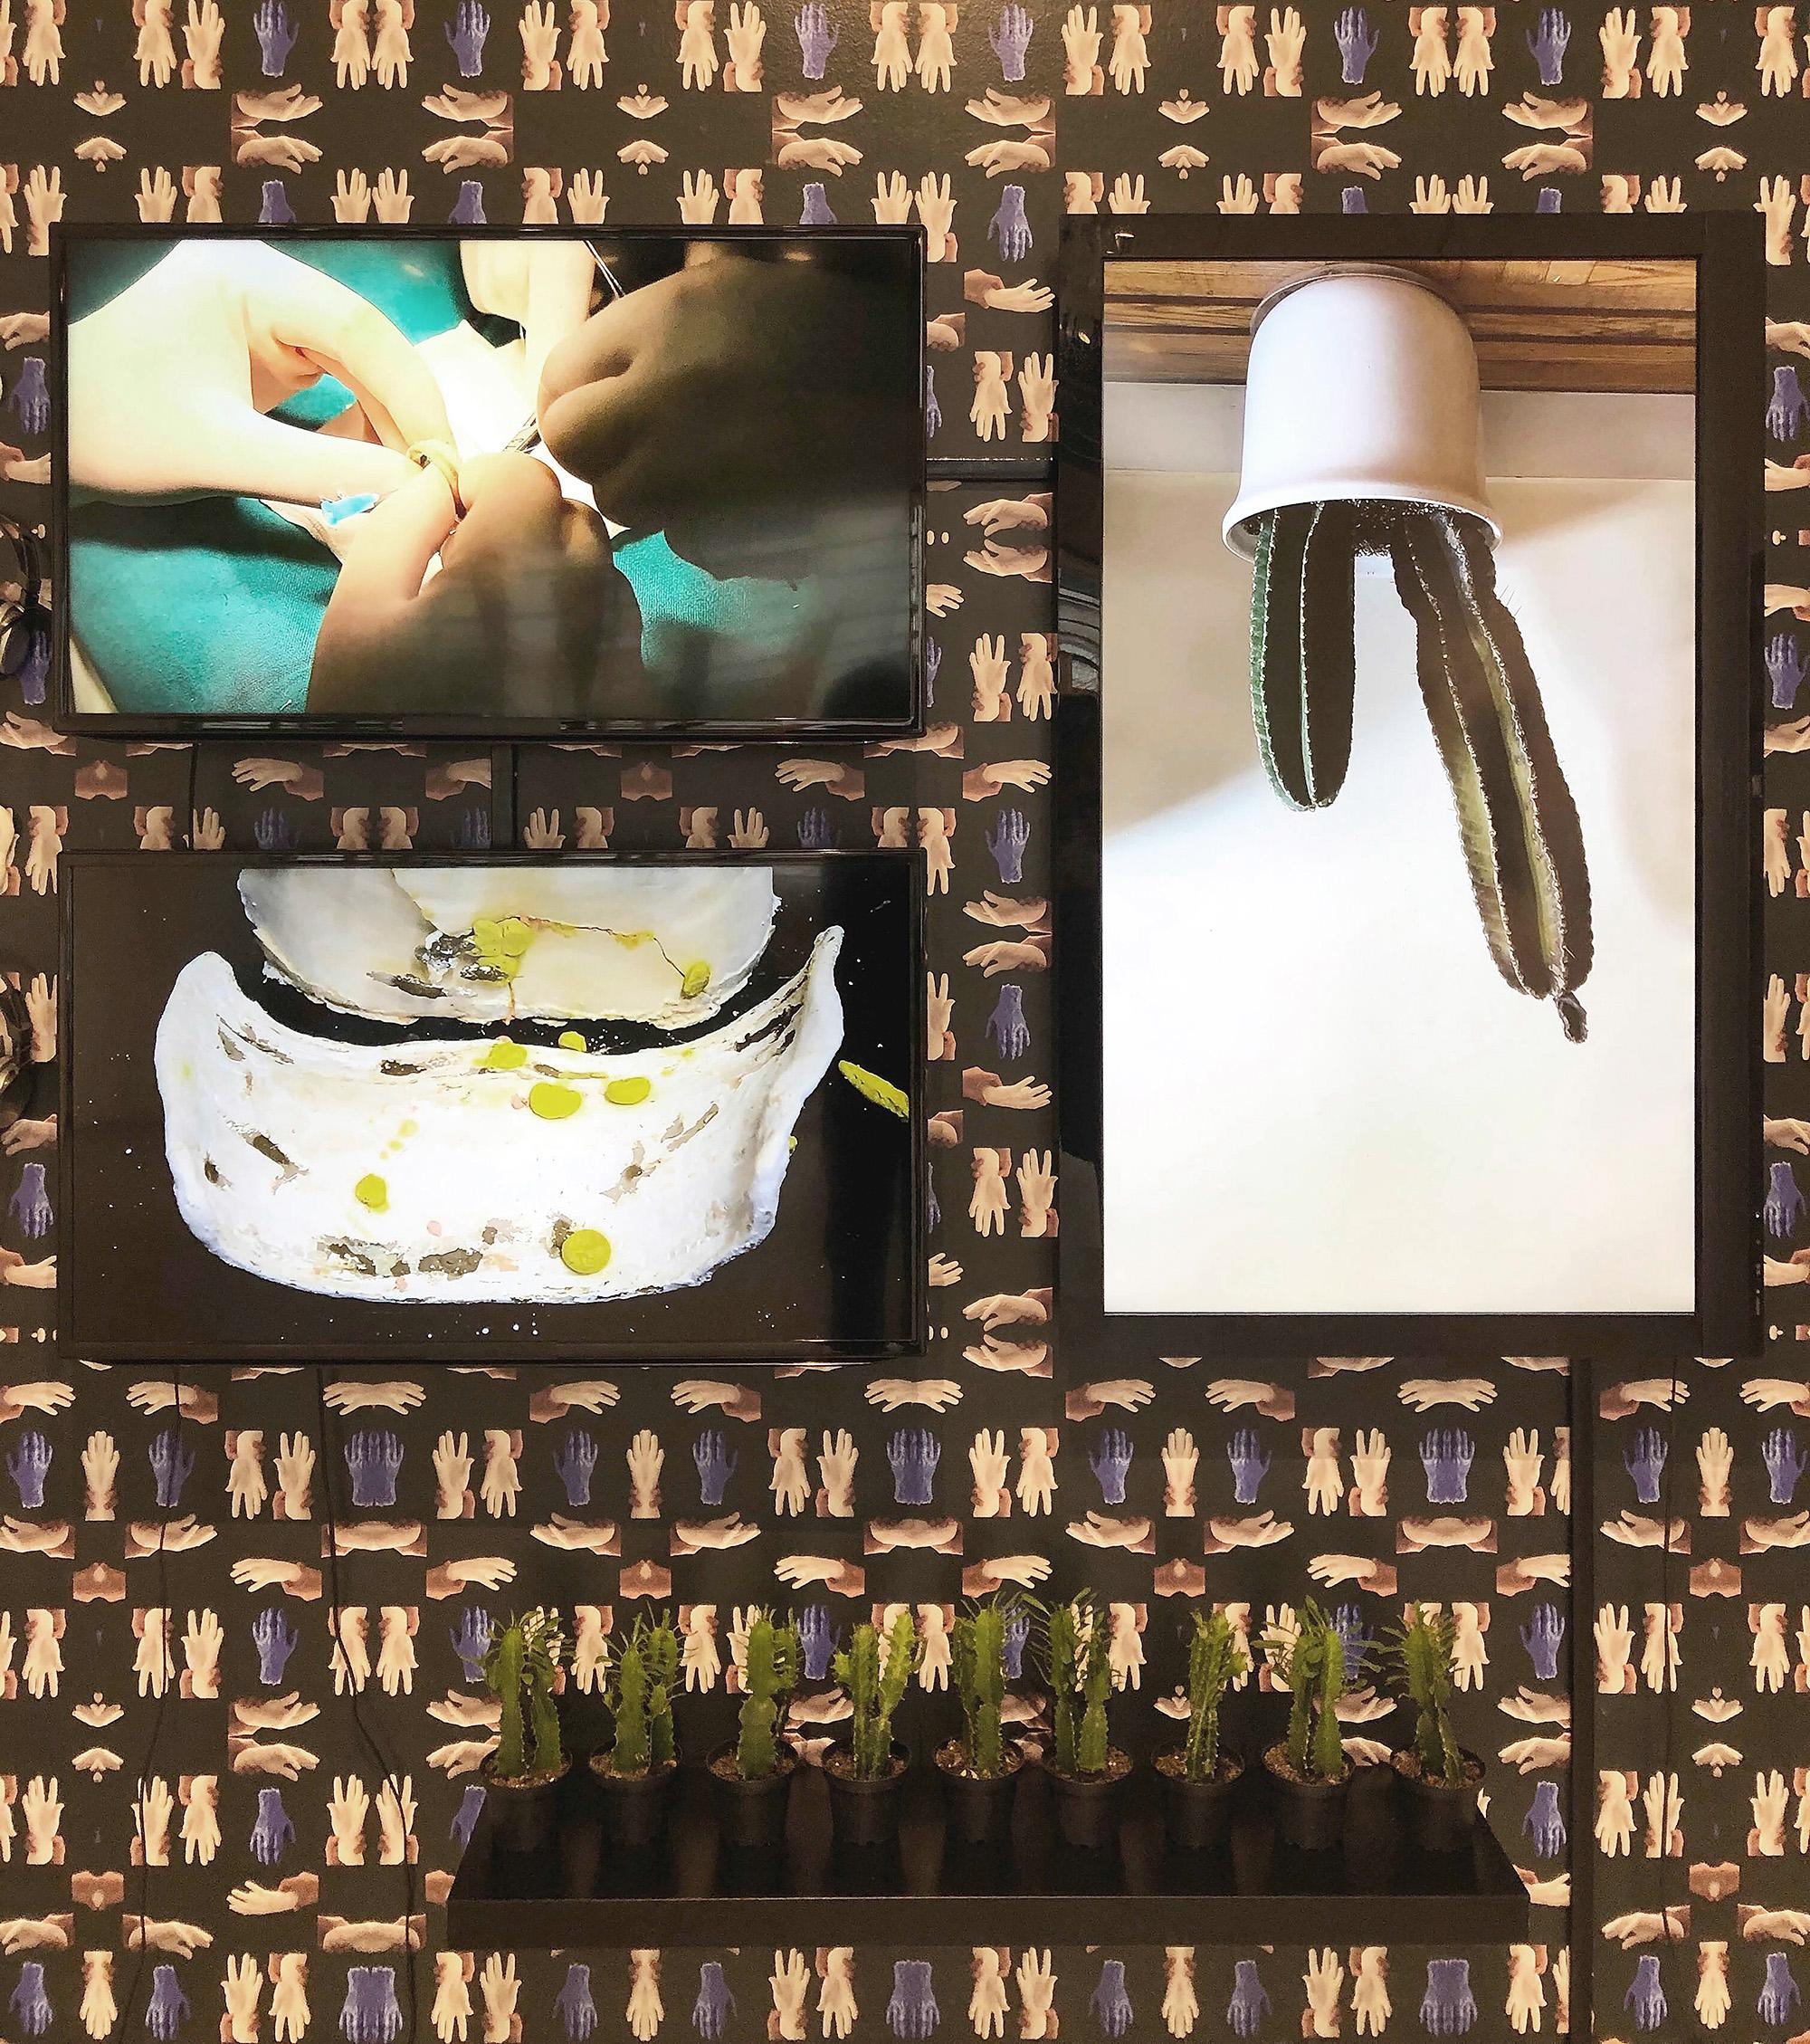 "Sareh Imani, Kindred Stitches (Installation view),  2018, Three channel video installation, stereo sound,loop, cacti, plaster, custom designed wallpaper, 144"" x 96"" x 12""."